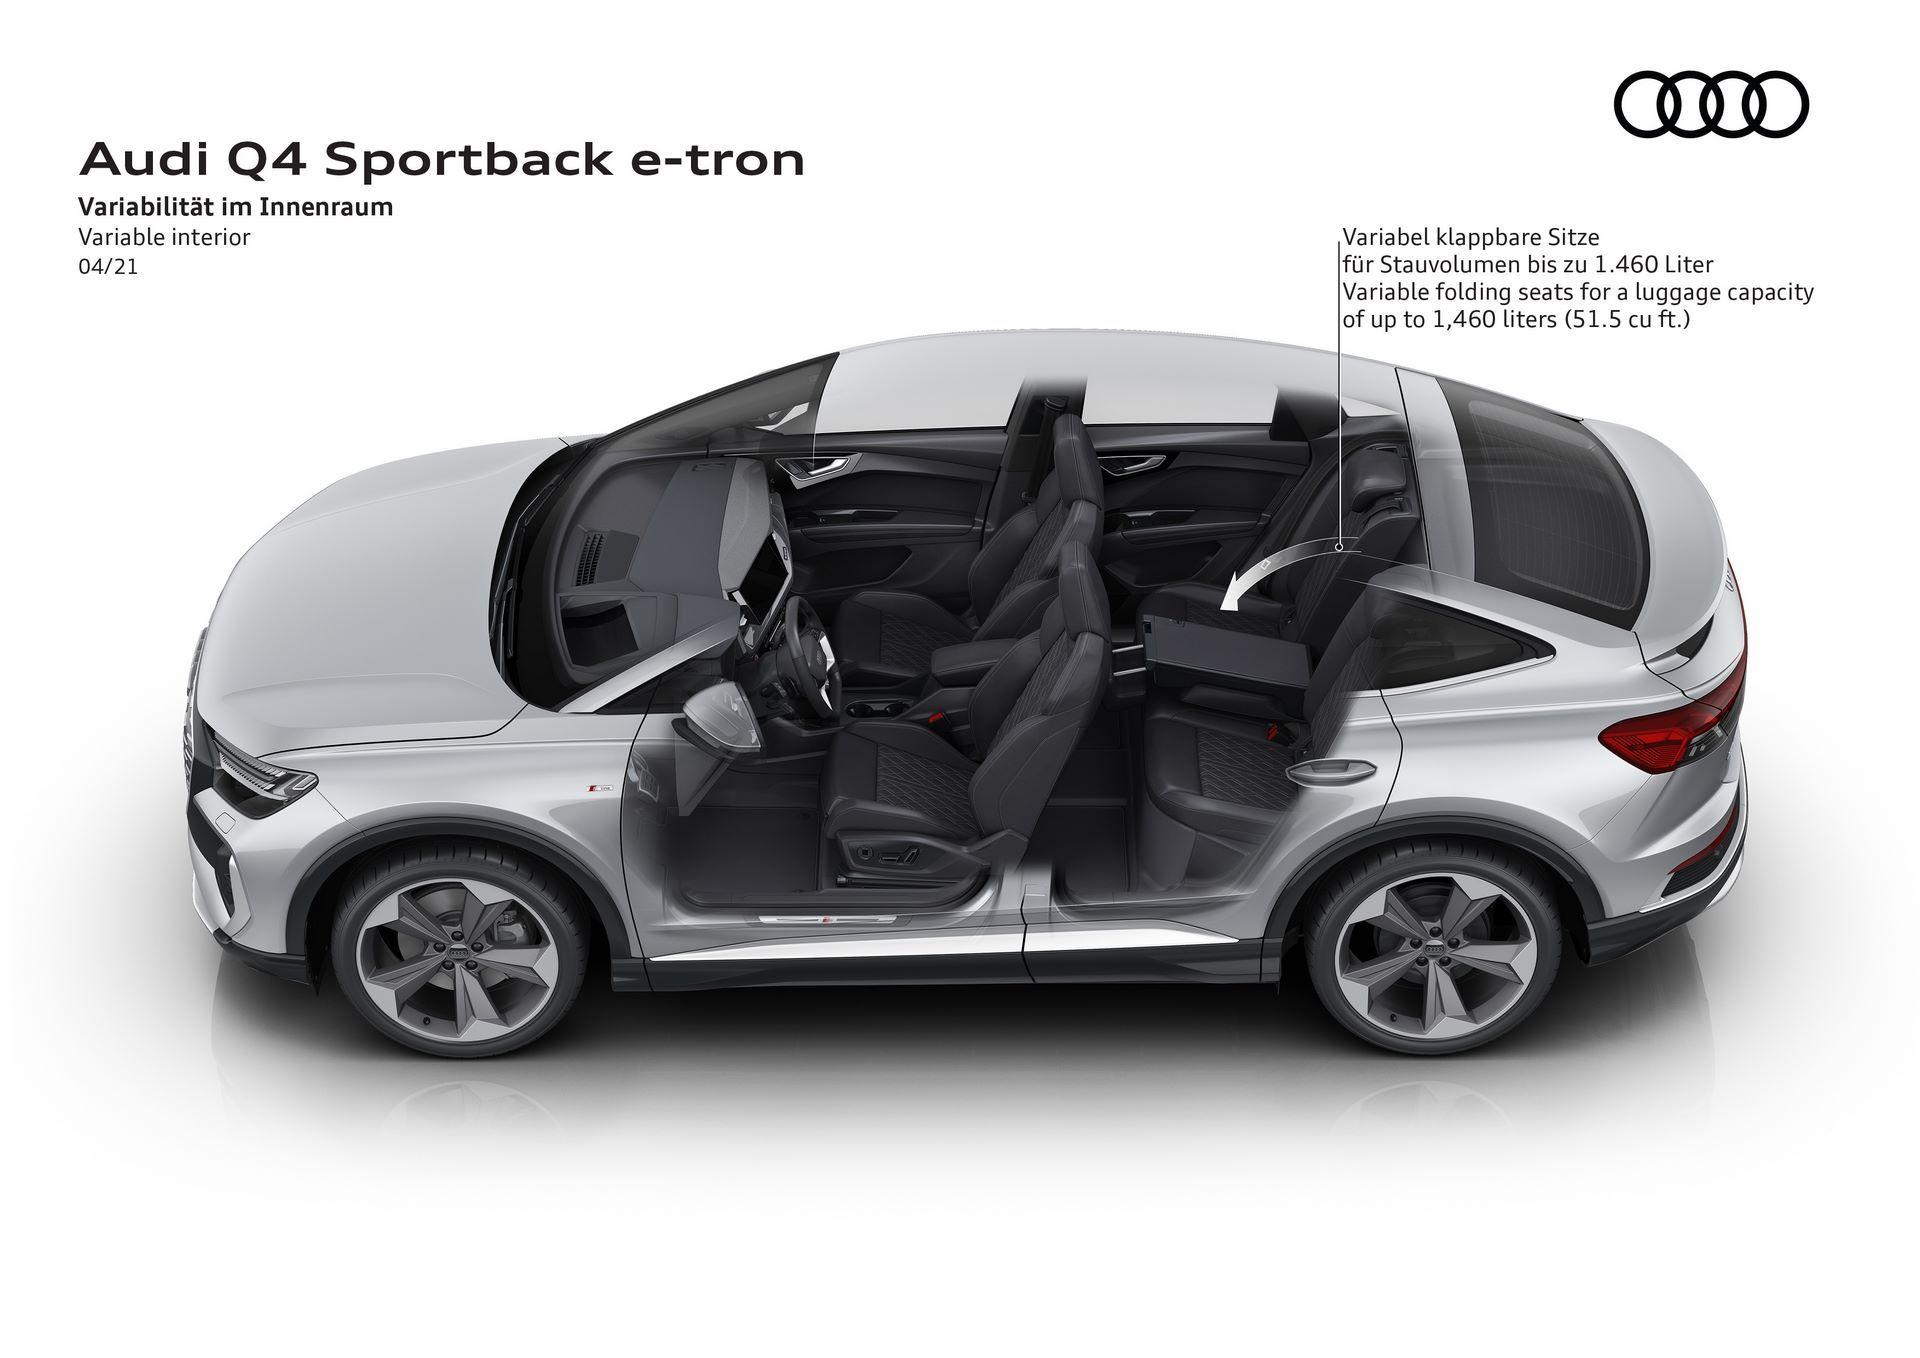 Audi-Q4-e-tron-and-Q4-e-tron-Sportback-142